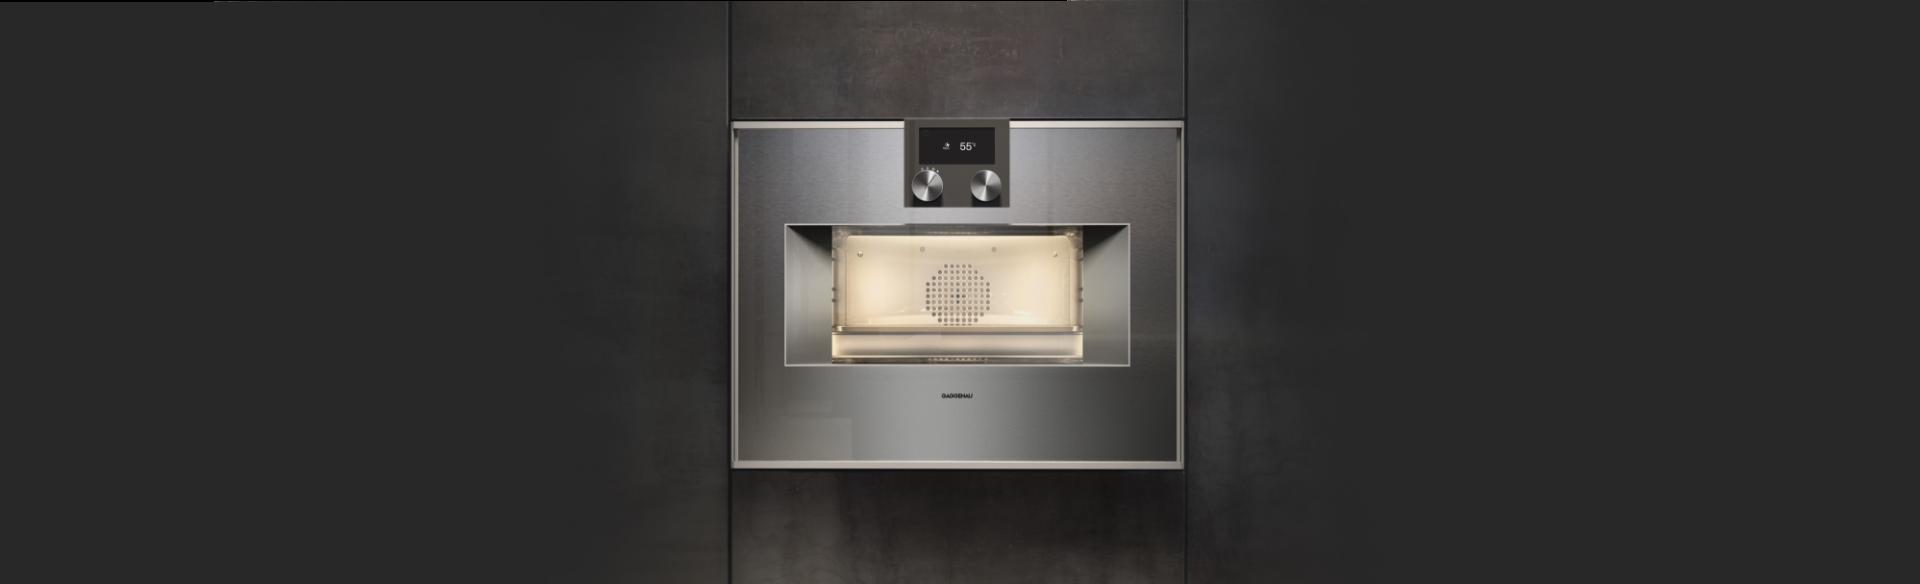 Gaggenau built-in oven